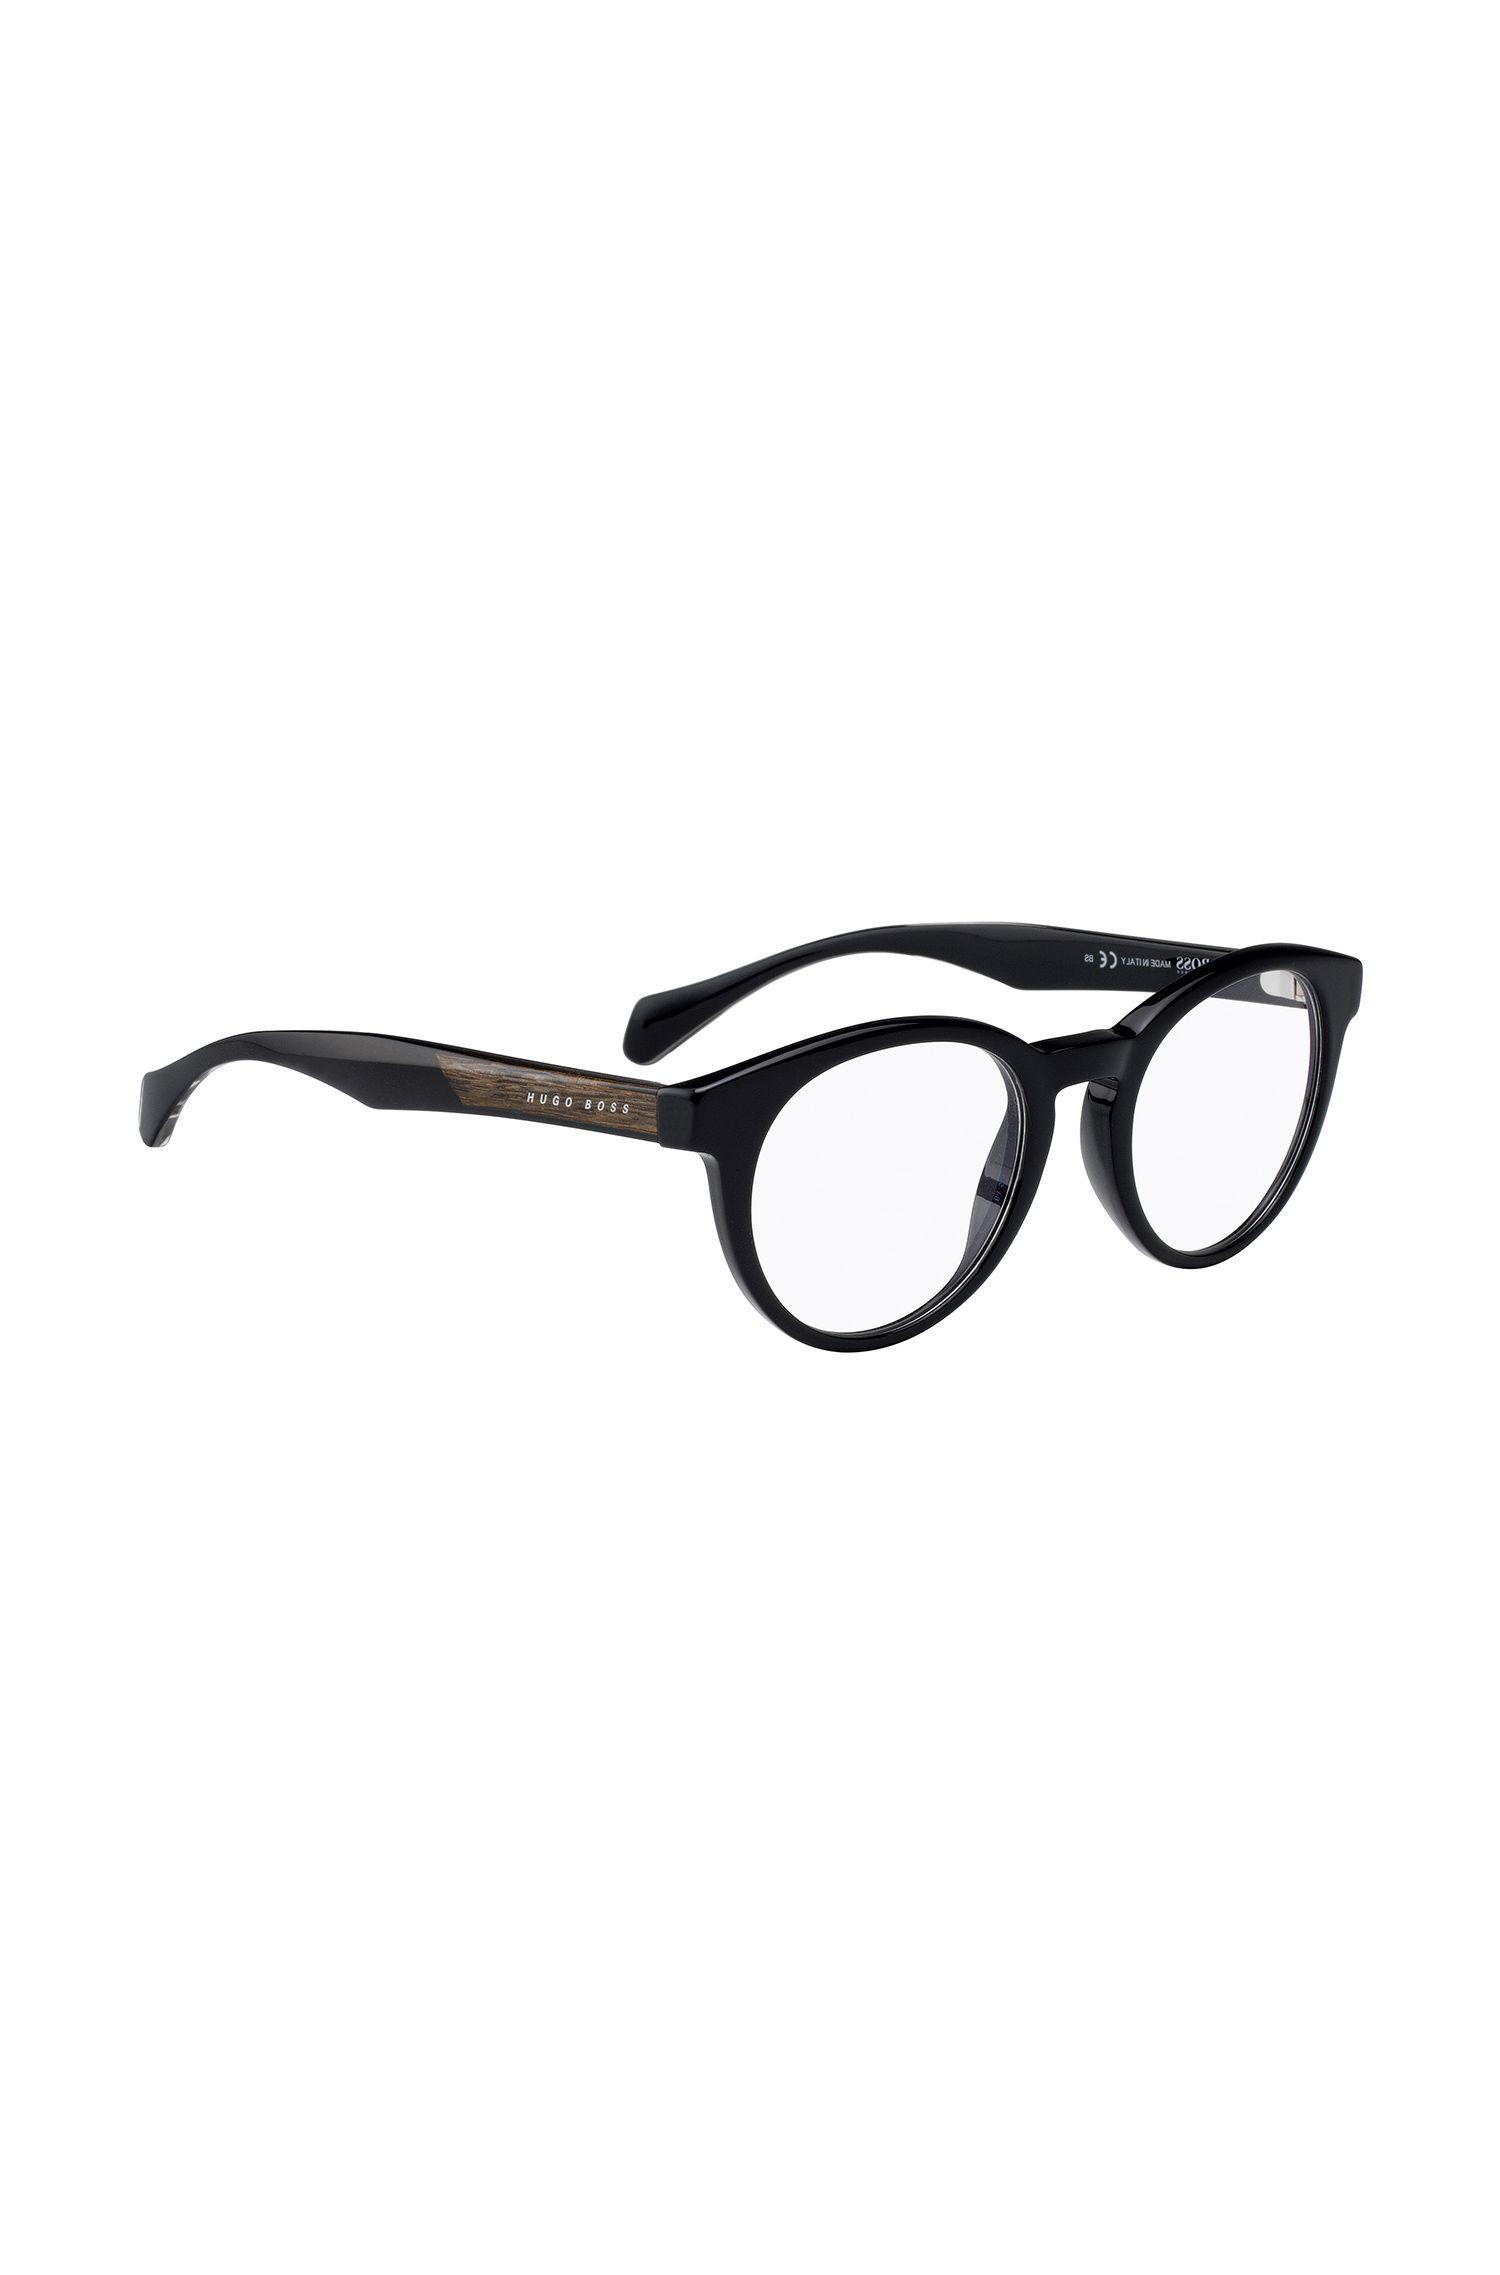 'BOSS 0913 1YS'   Black Acetate Round Optical Frames